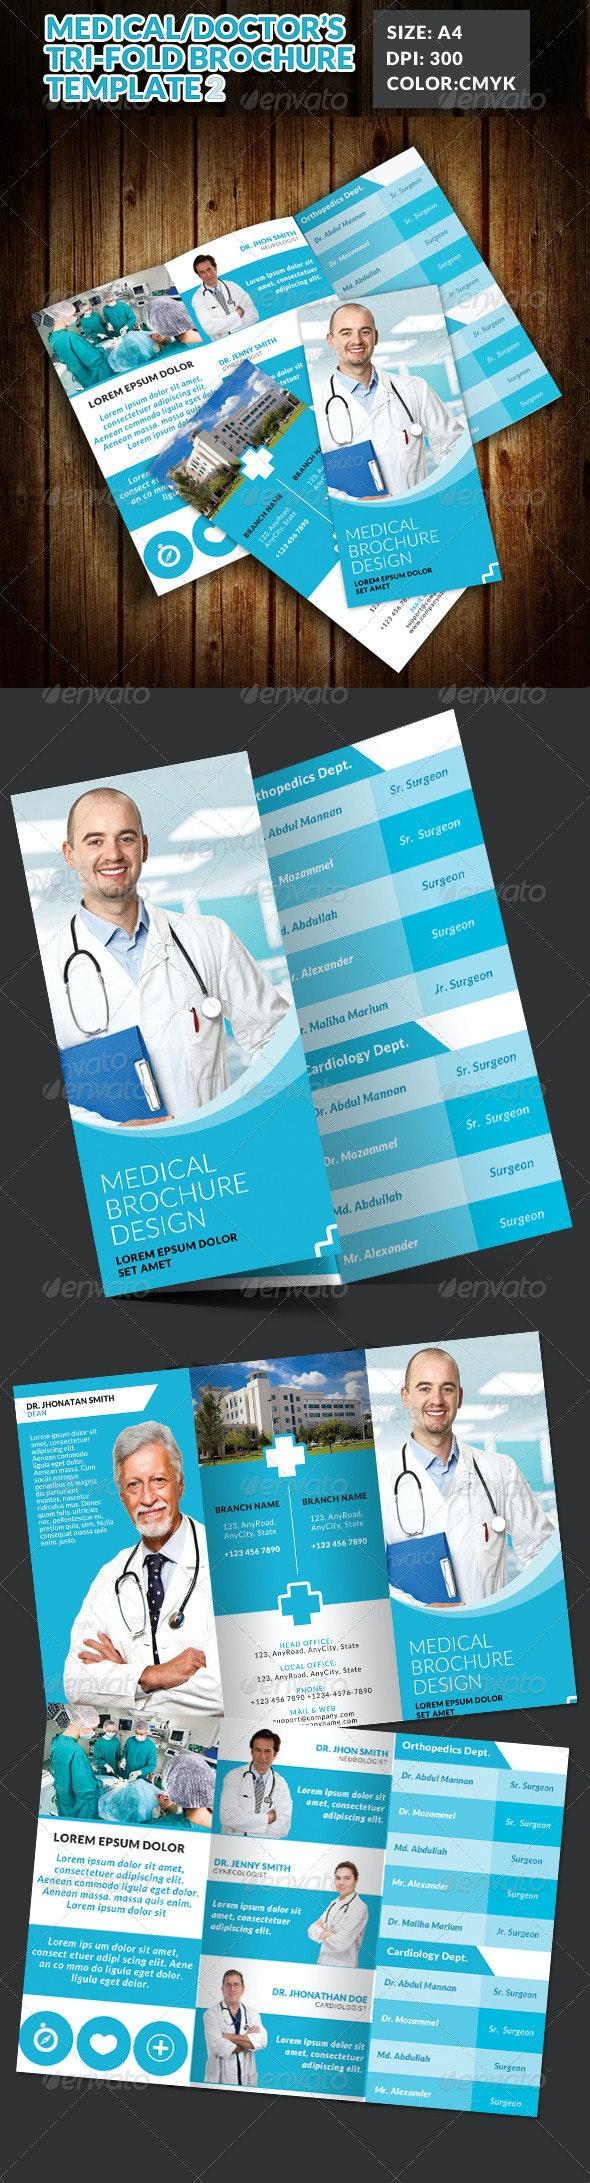 Doctor Medical Hospital Health Tri-Fold Brochure 2 - Corporate Brochures